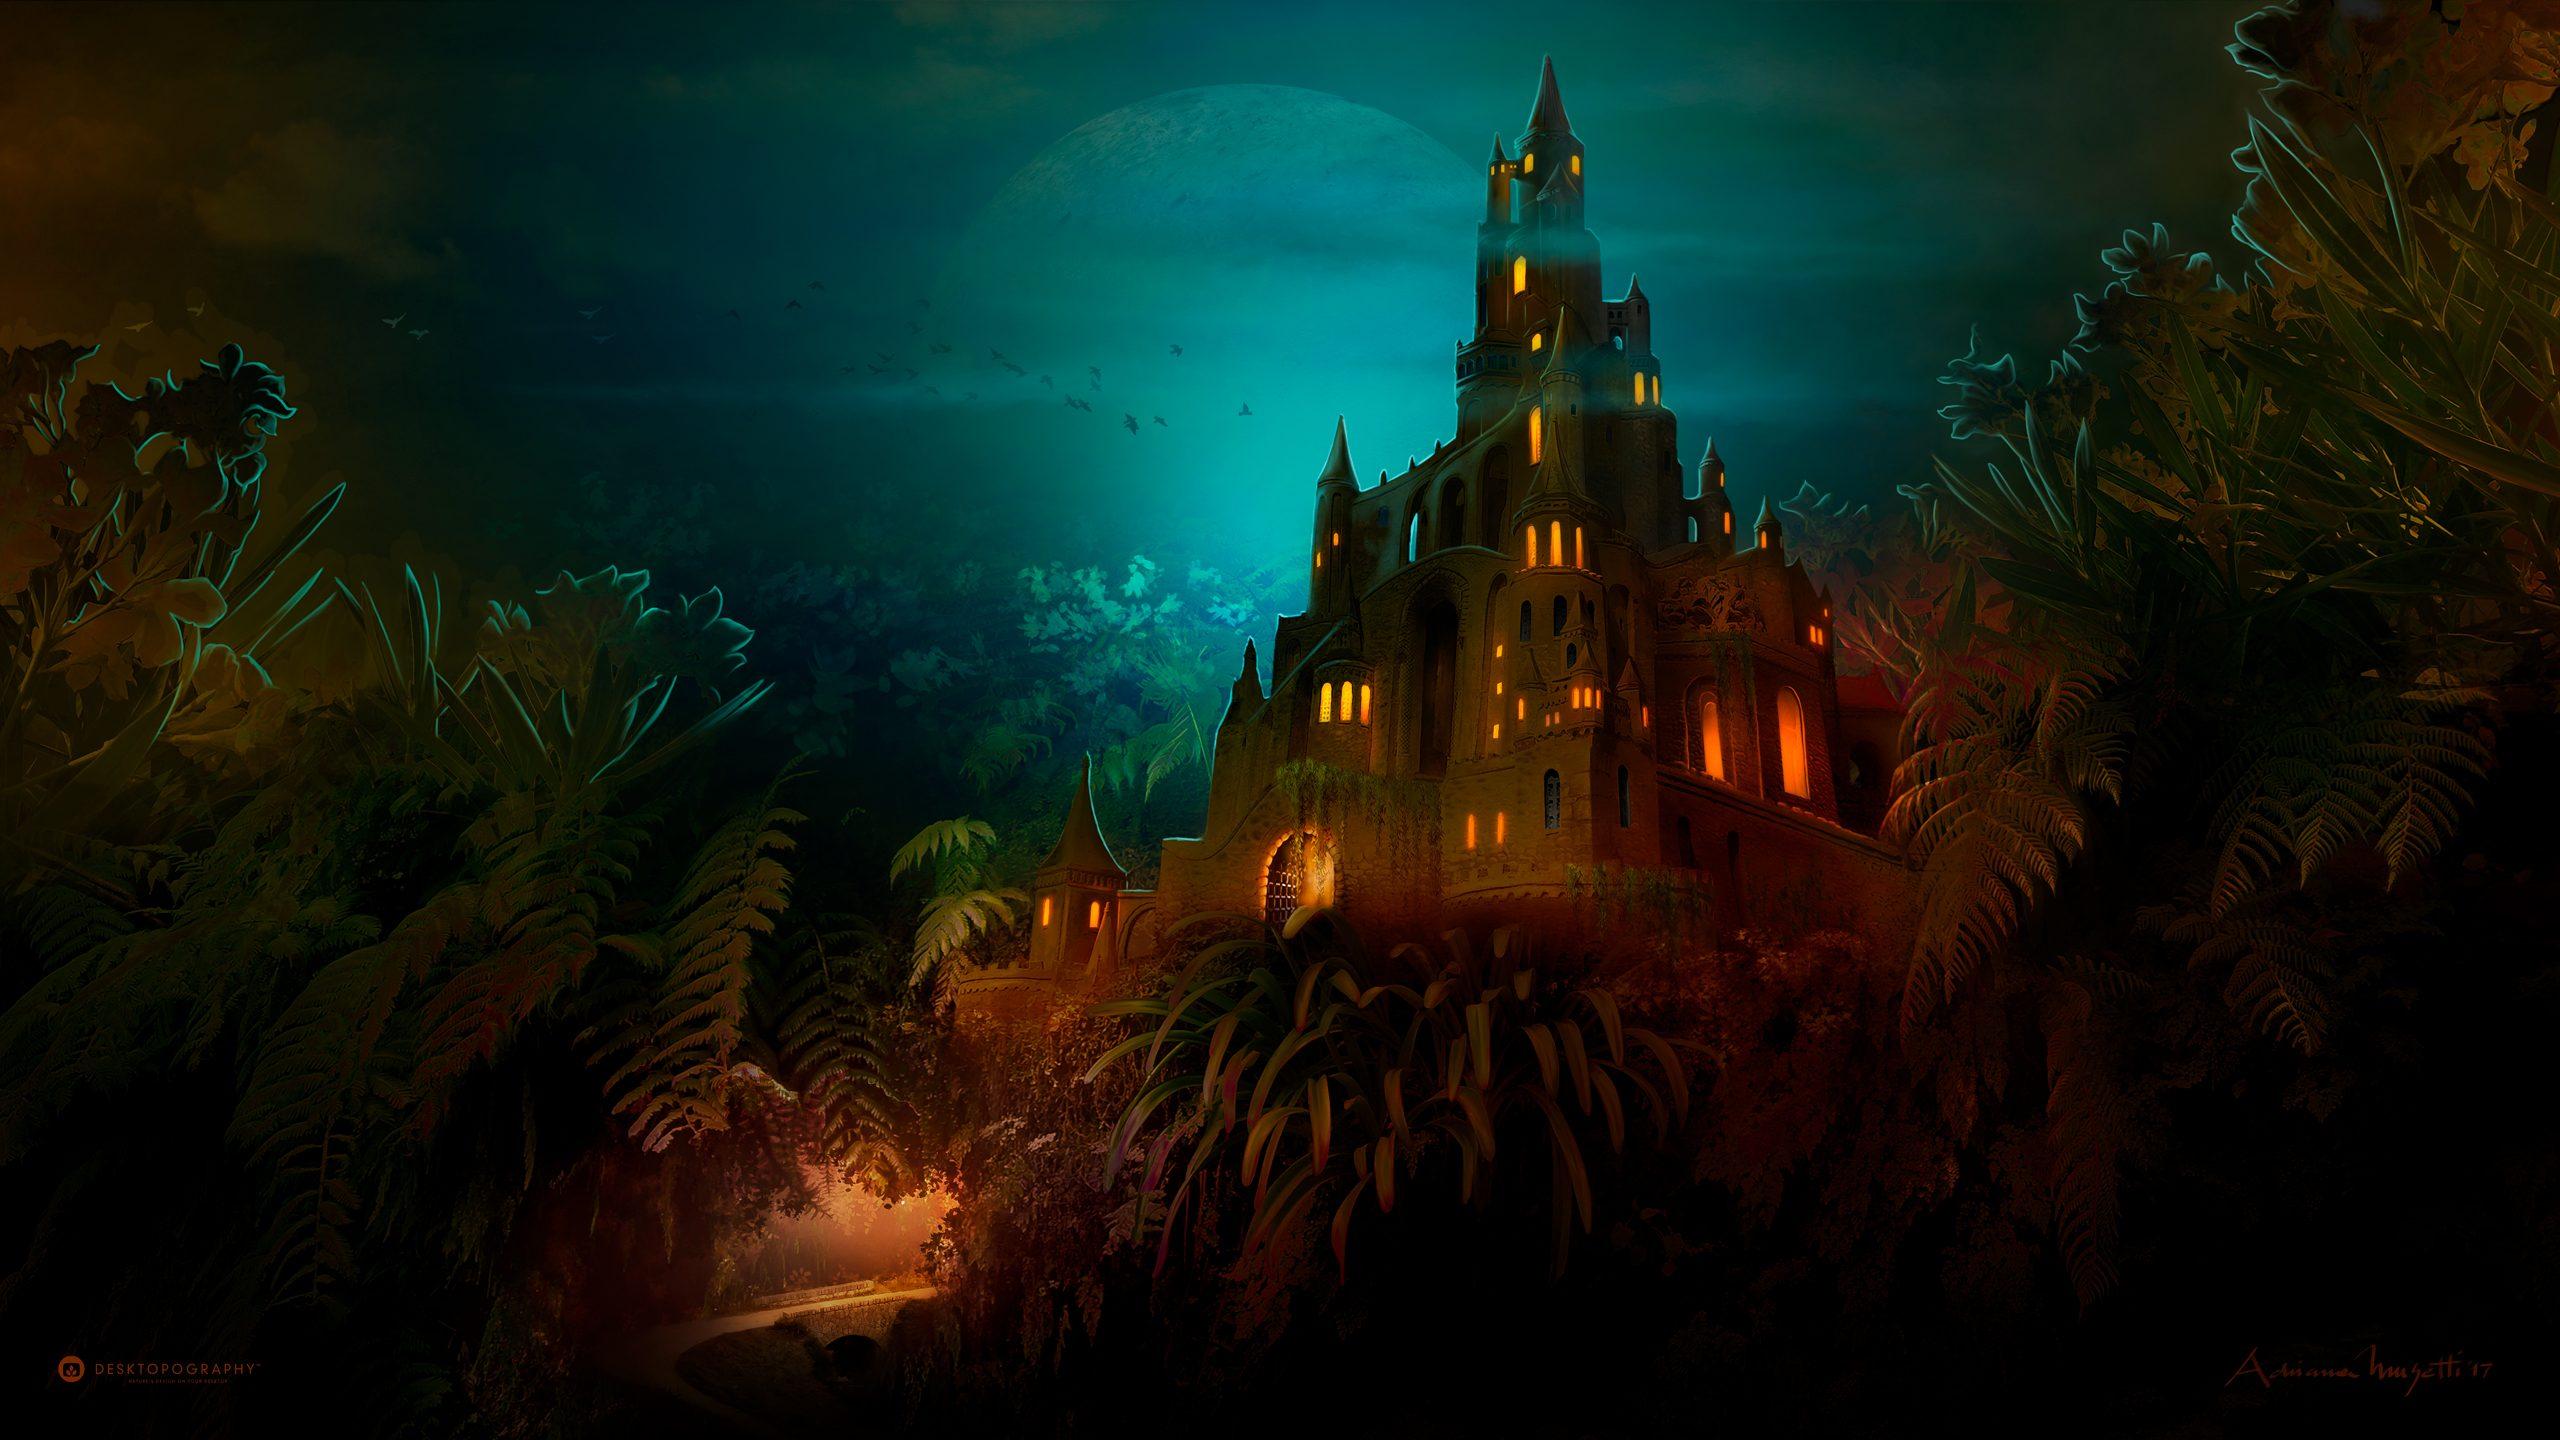 Lilliput Castle and Lilliput castle at night - Desktopography